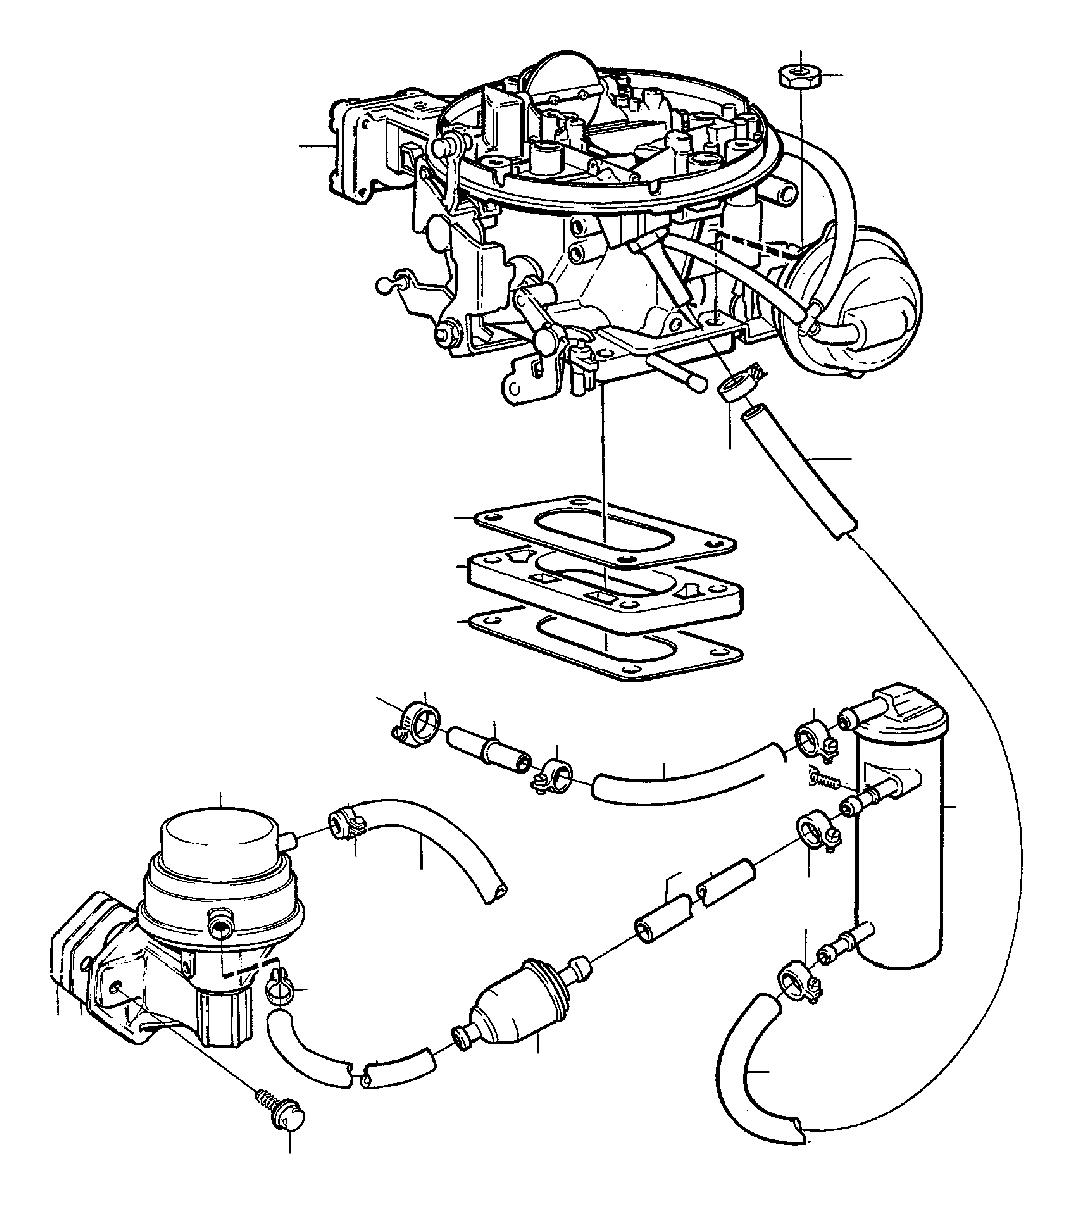 Volvo 240 Fuel Pumprked Sev 1 Pcs 2 4cyl